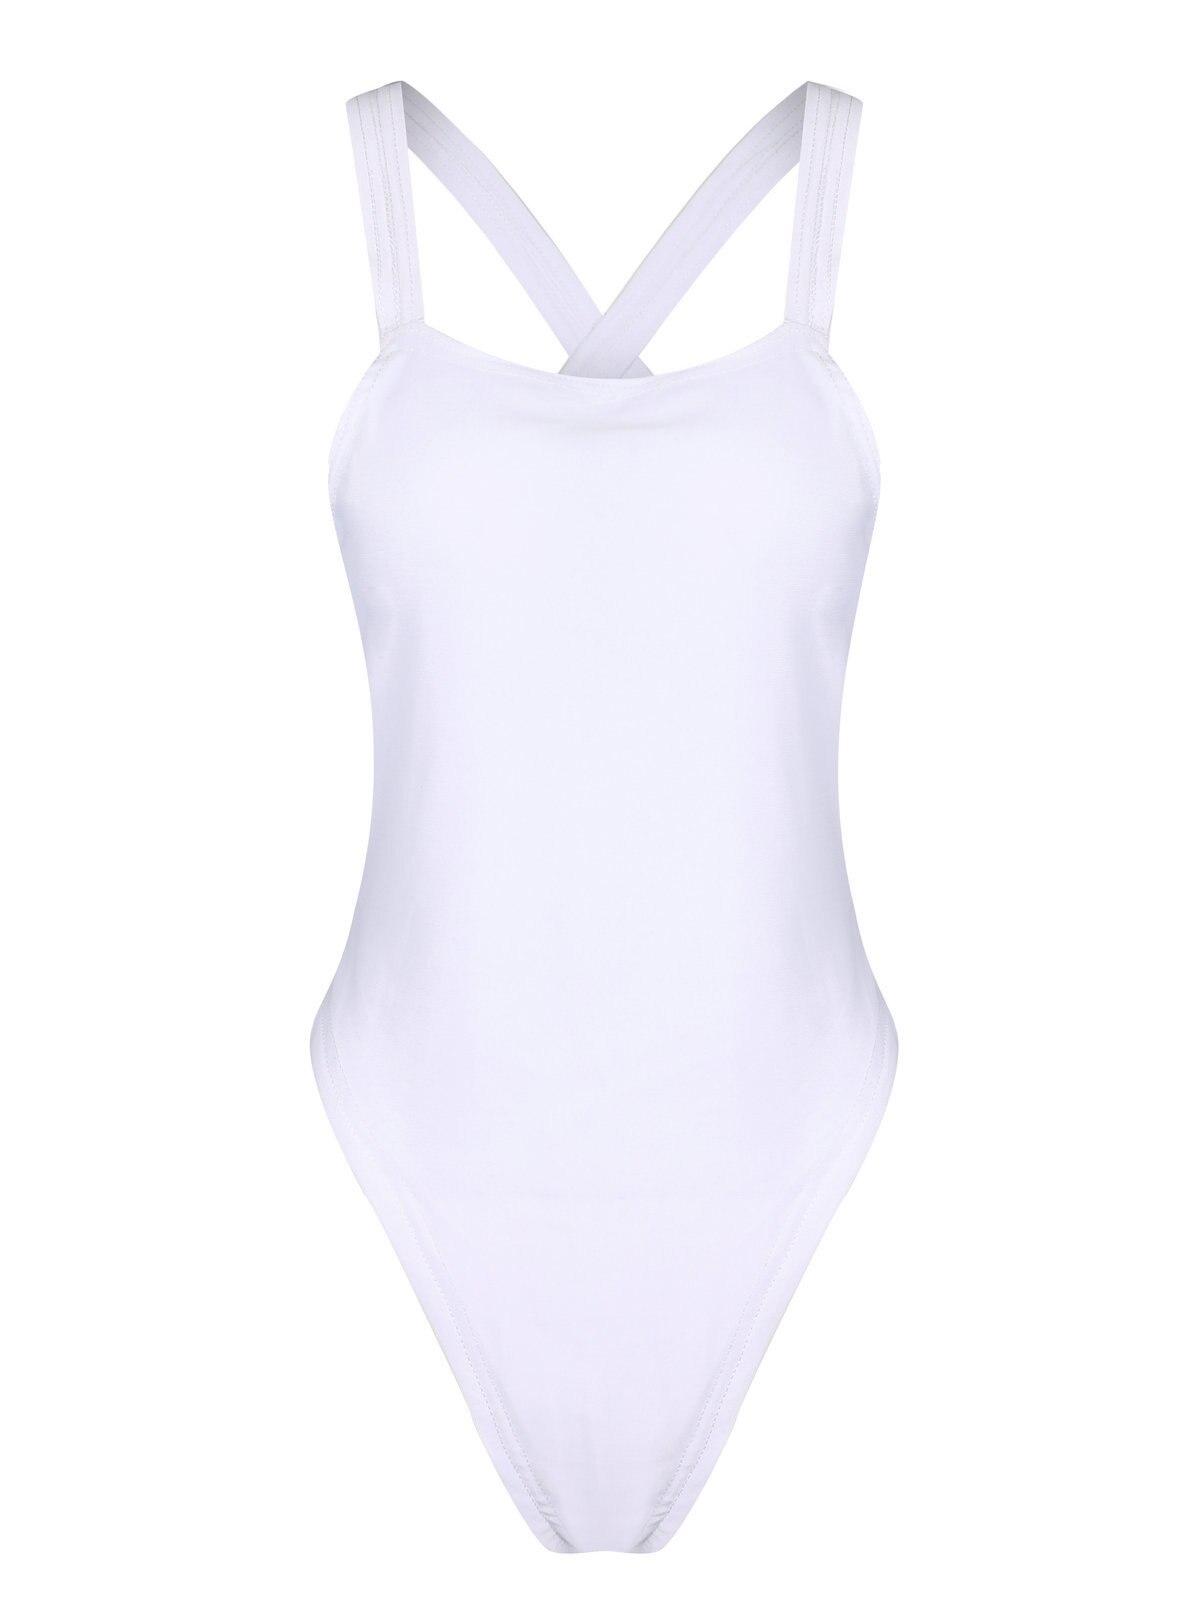 Sexy Solid Color Back Cross-Body OnePiece Swimsuit Backless Swimsuit For Women Swimwear Female Bathing Suit Swim Beachwear Mujer